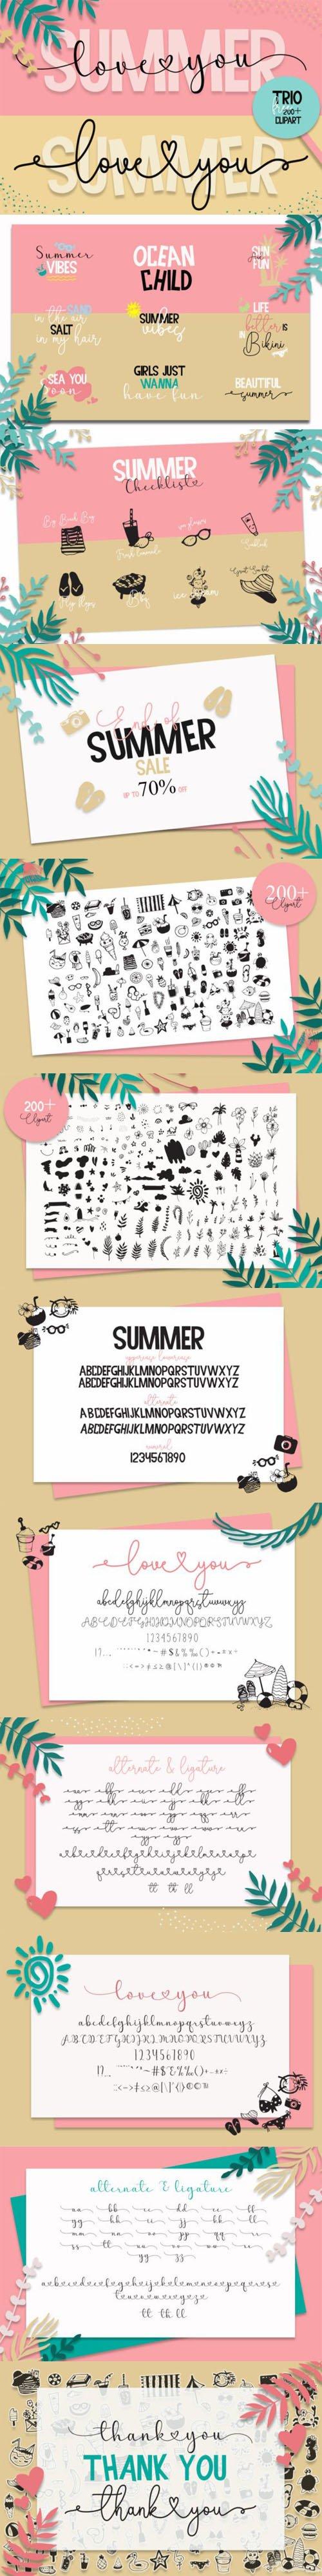 Summer Love You - Playful Duo Font [3-Weights] + Clipart Bonus